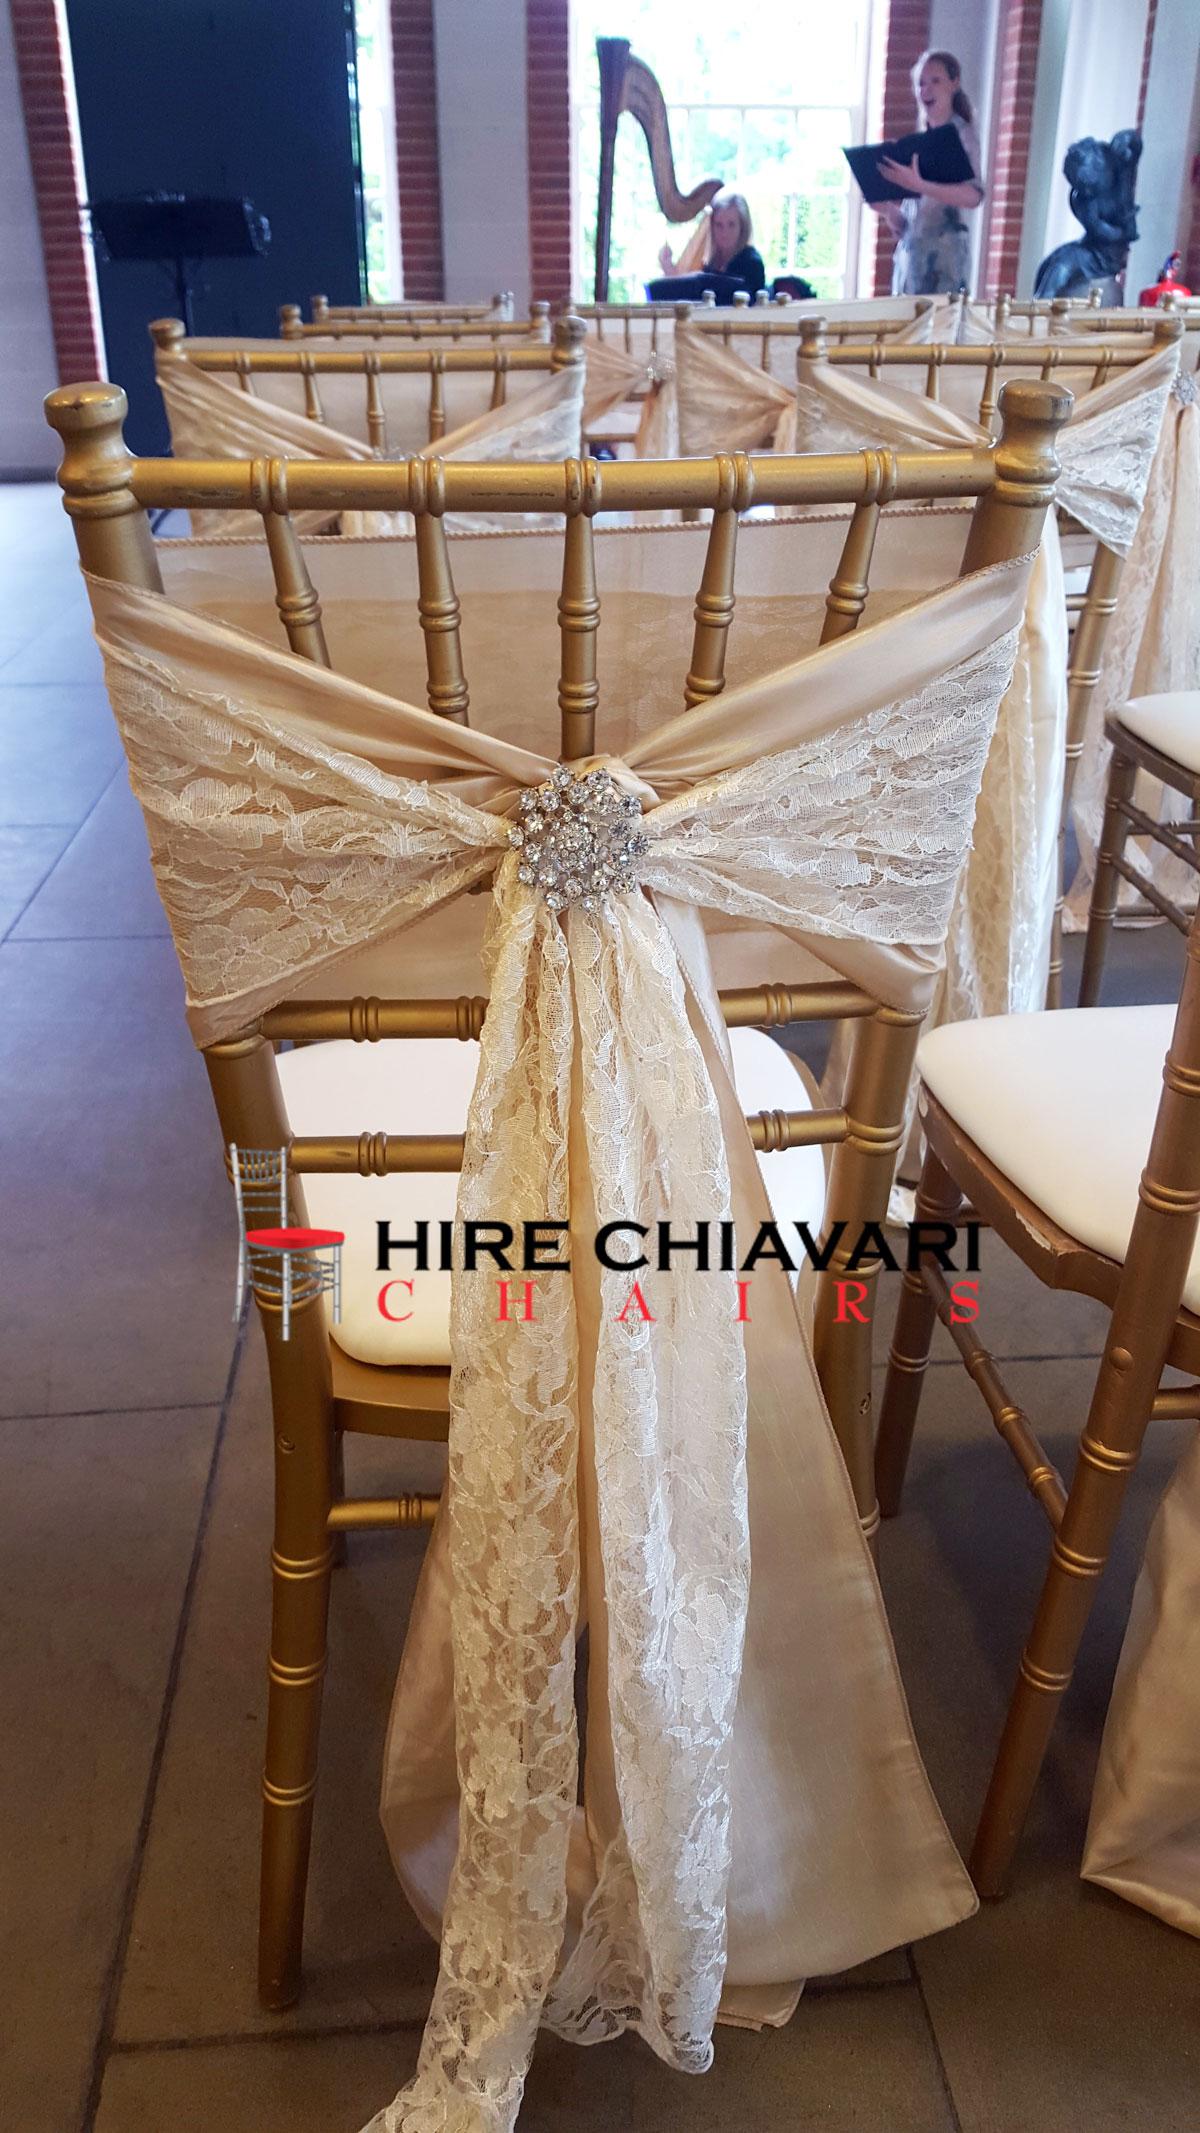 Gold chiavari chairs Hire Chiavari Chairs Chiavari Chair Hire